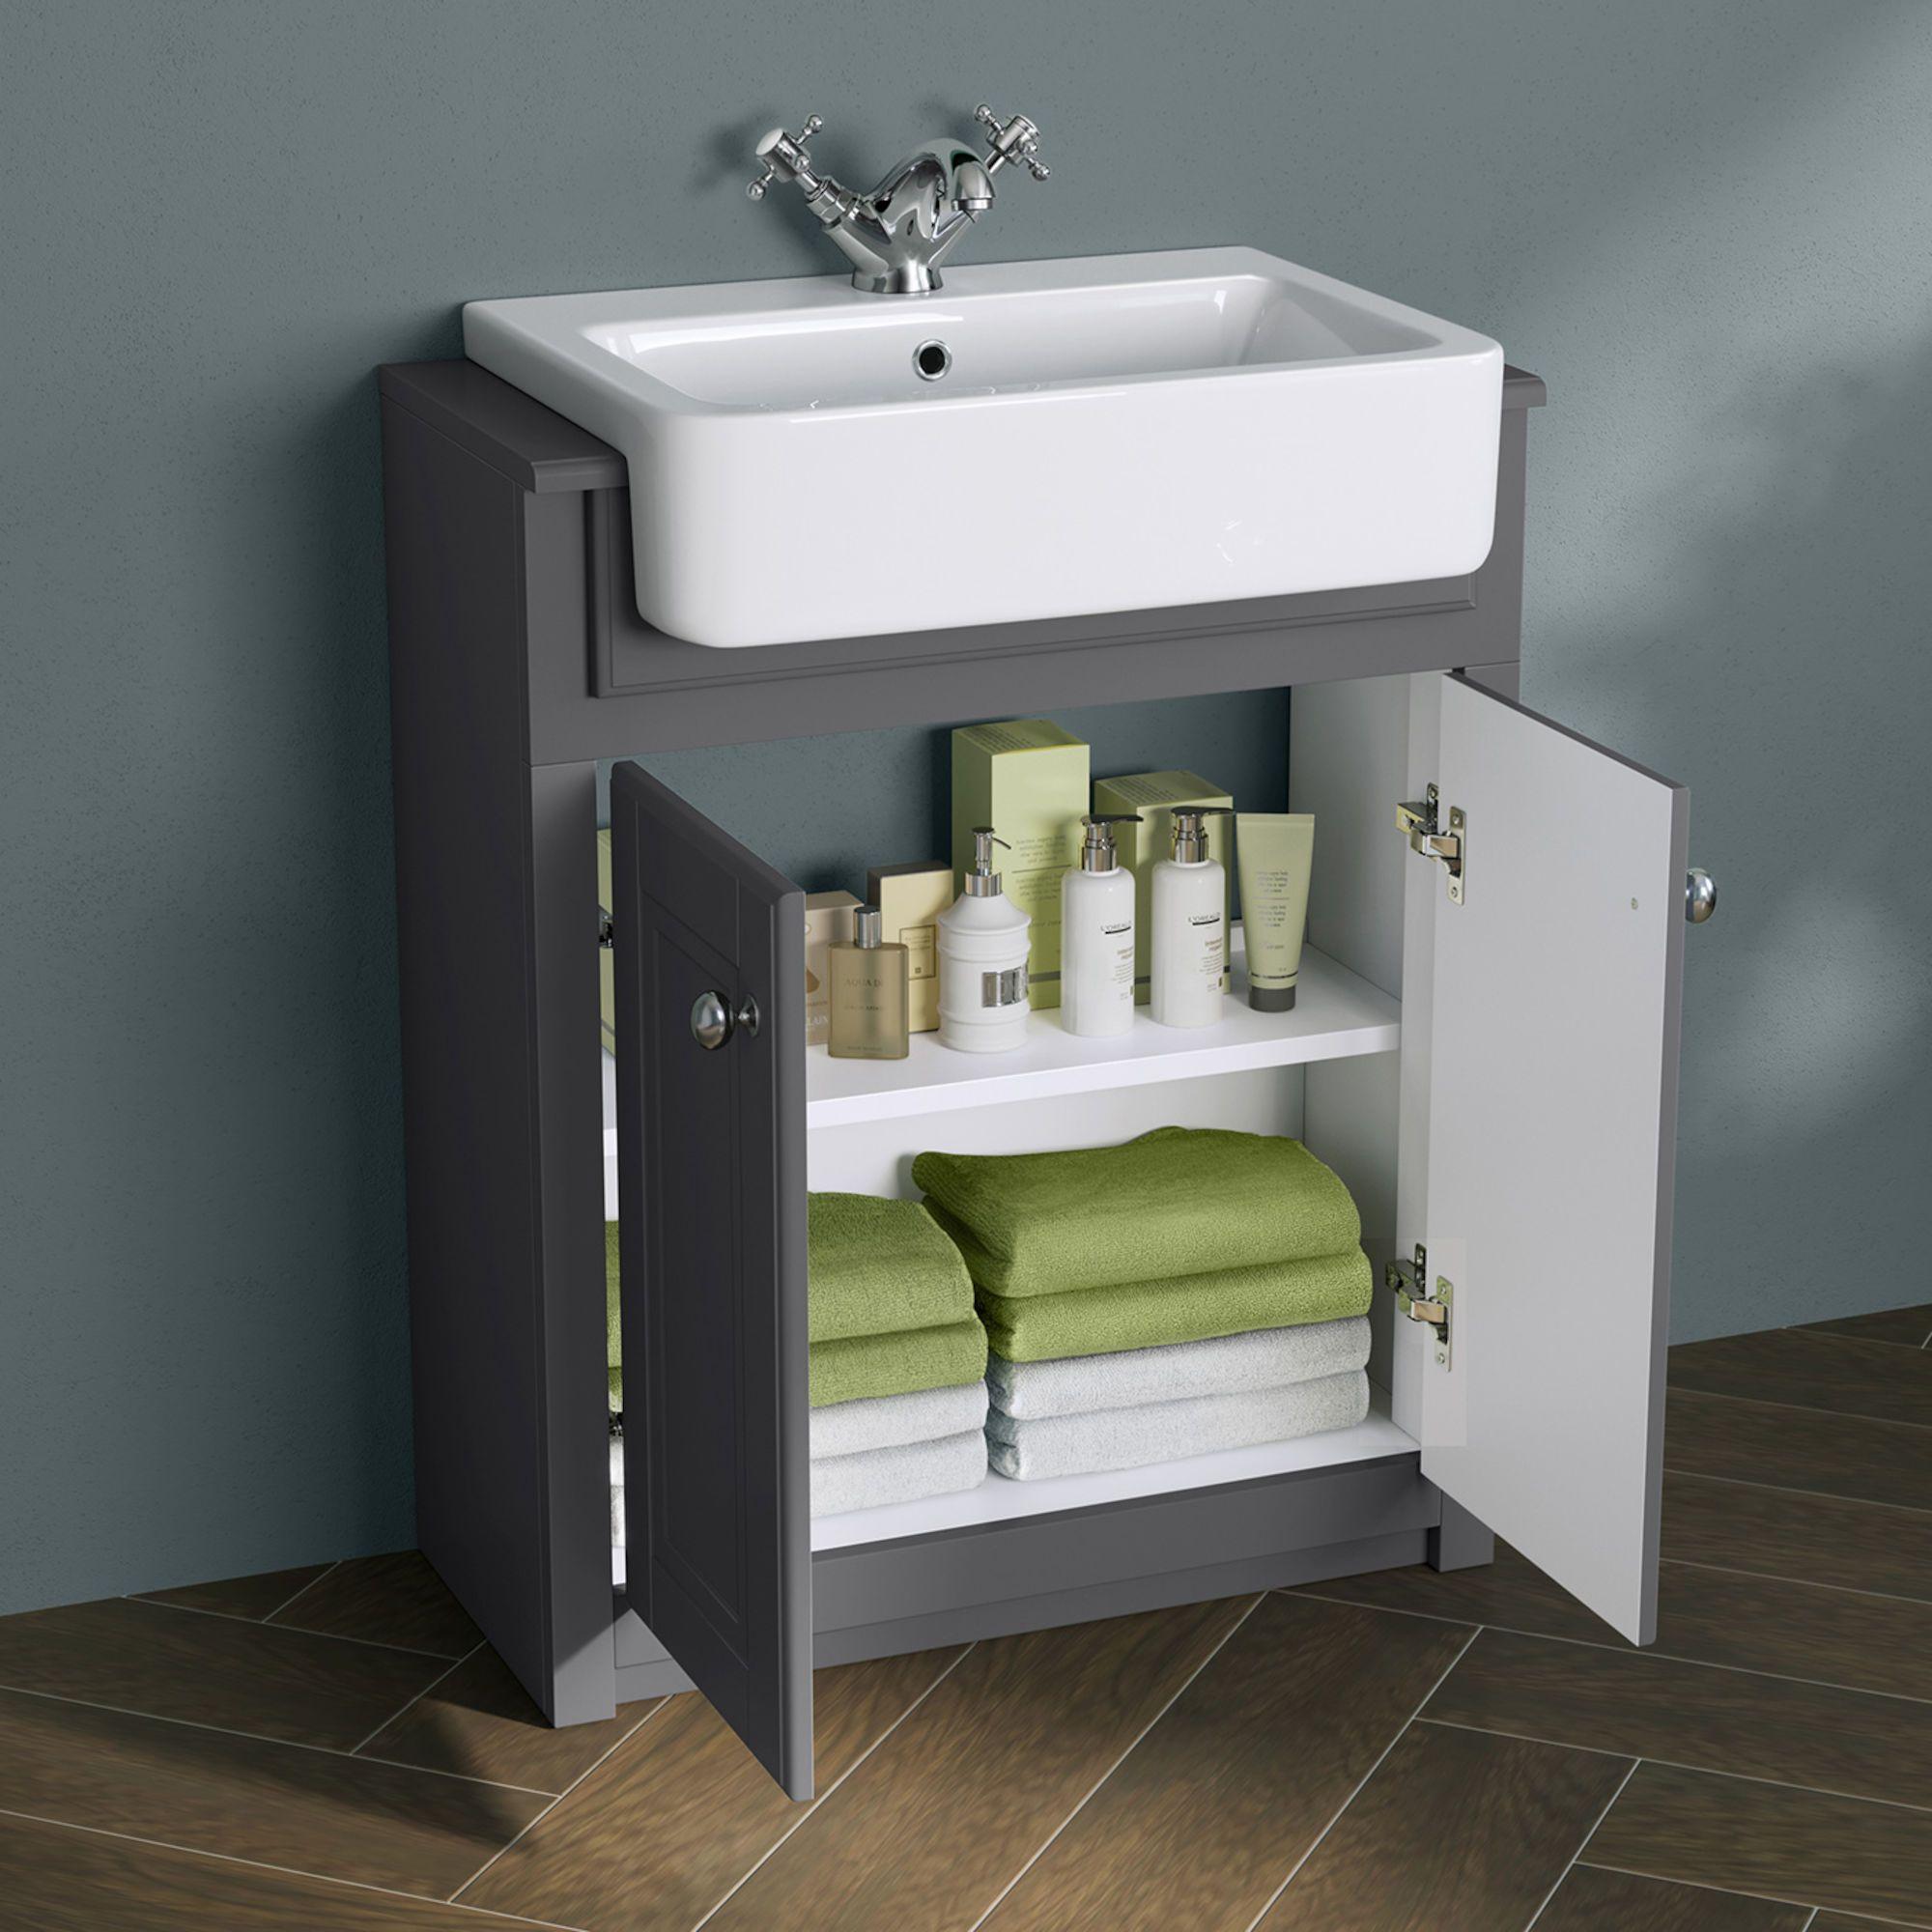 667mm Cambridge Midnight Grey Floorstanding Basin Vanity Unit Soak Com Basin Vanity Unit Vanity Units Sink Vanity Unit